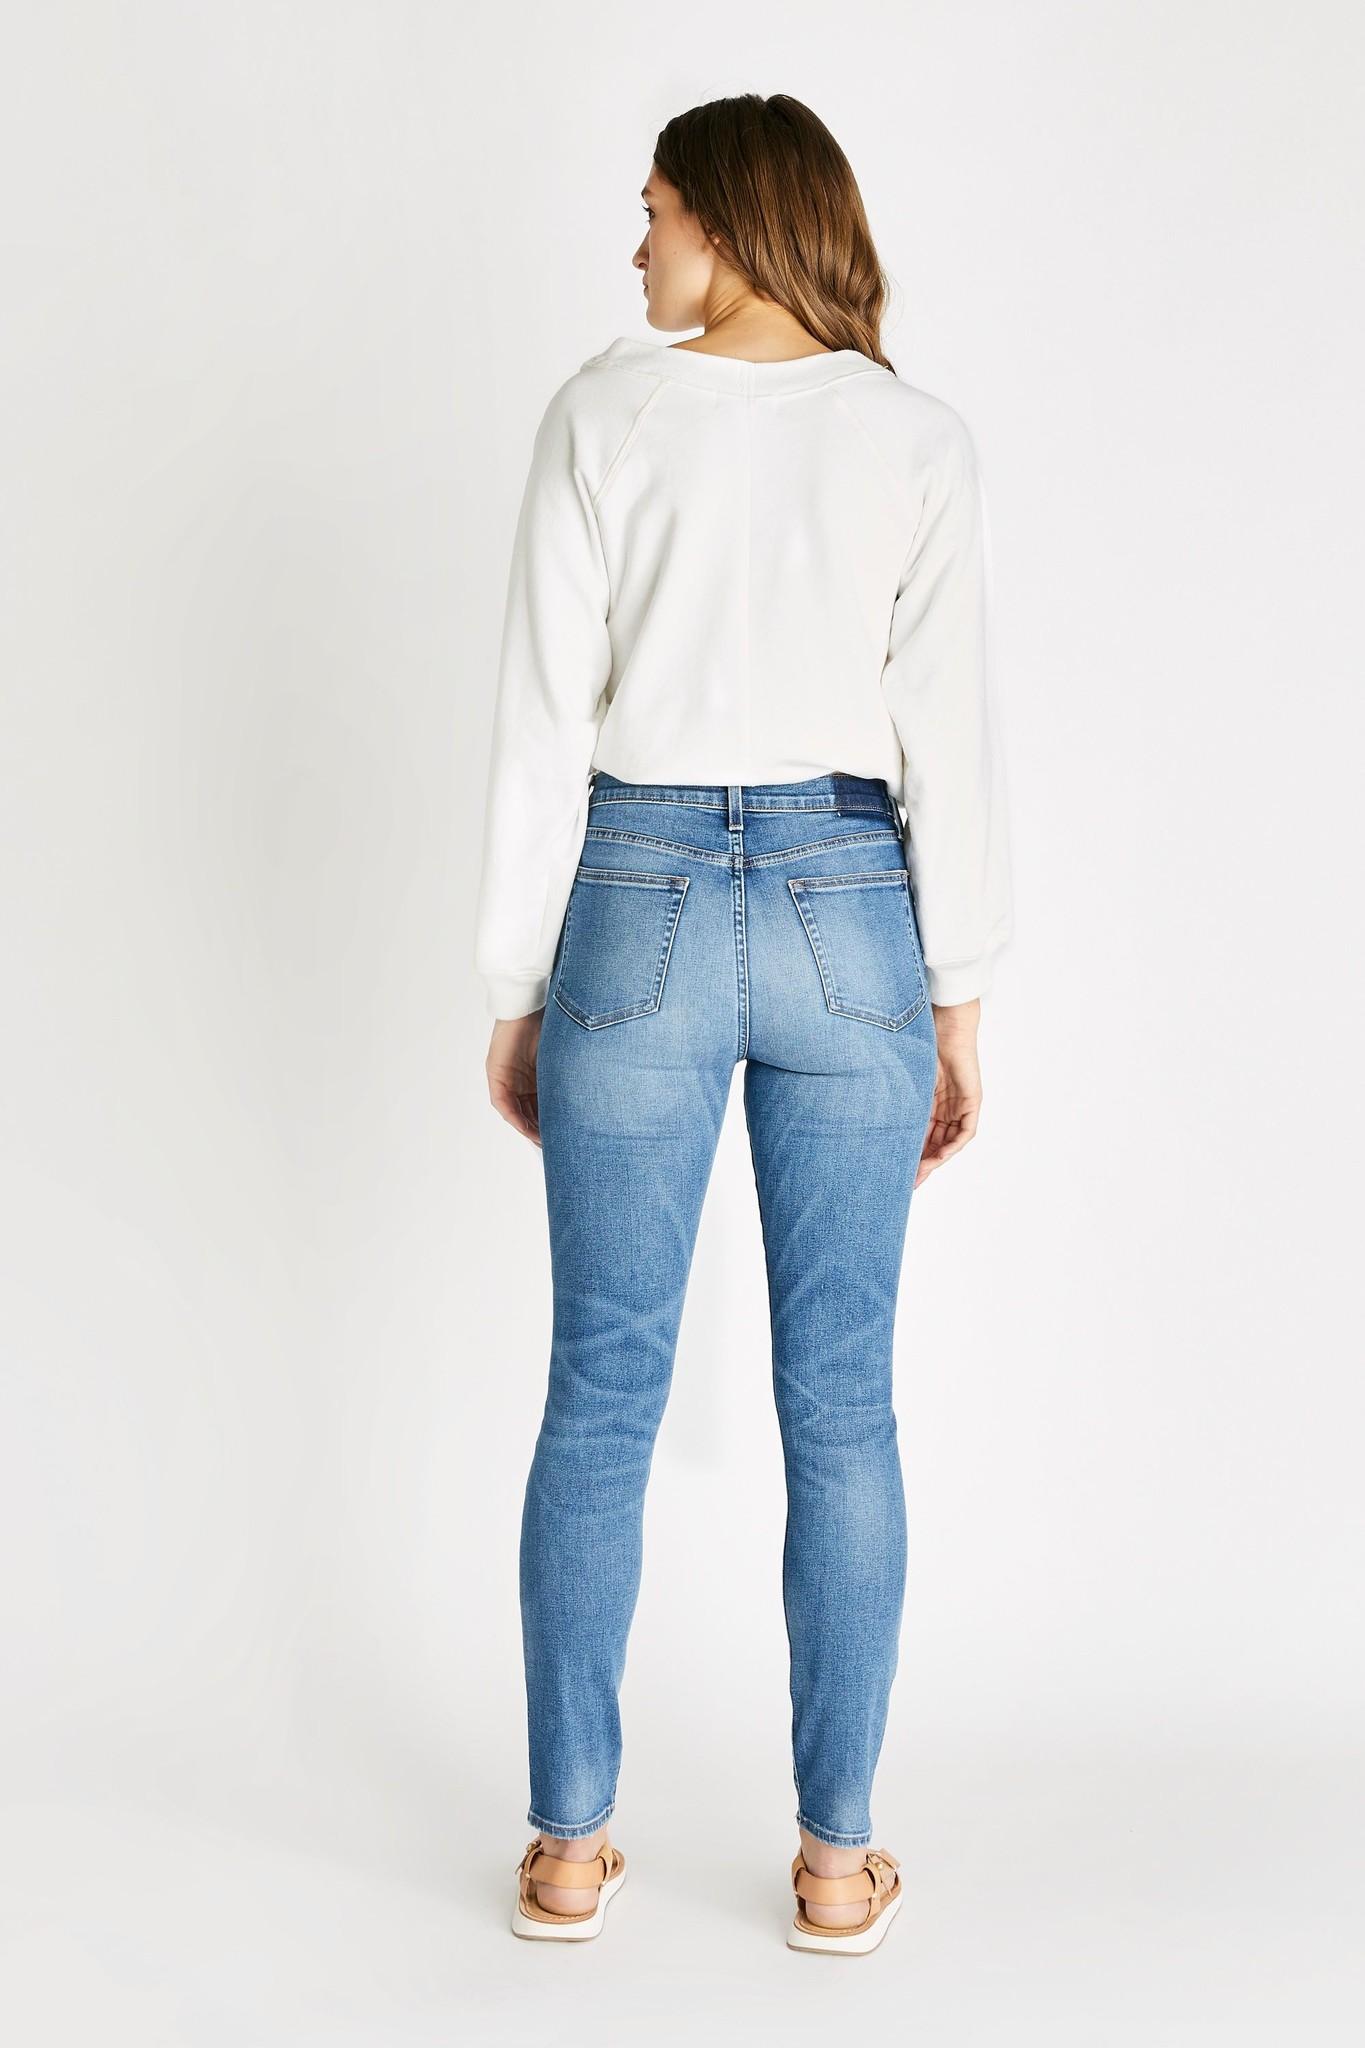 Etica Giselle Skinny Jeans